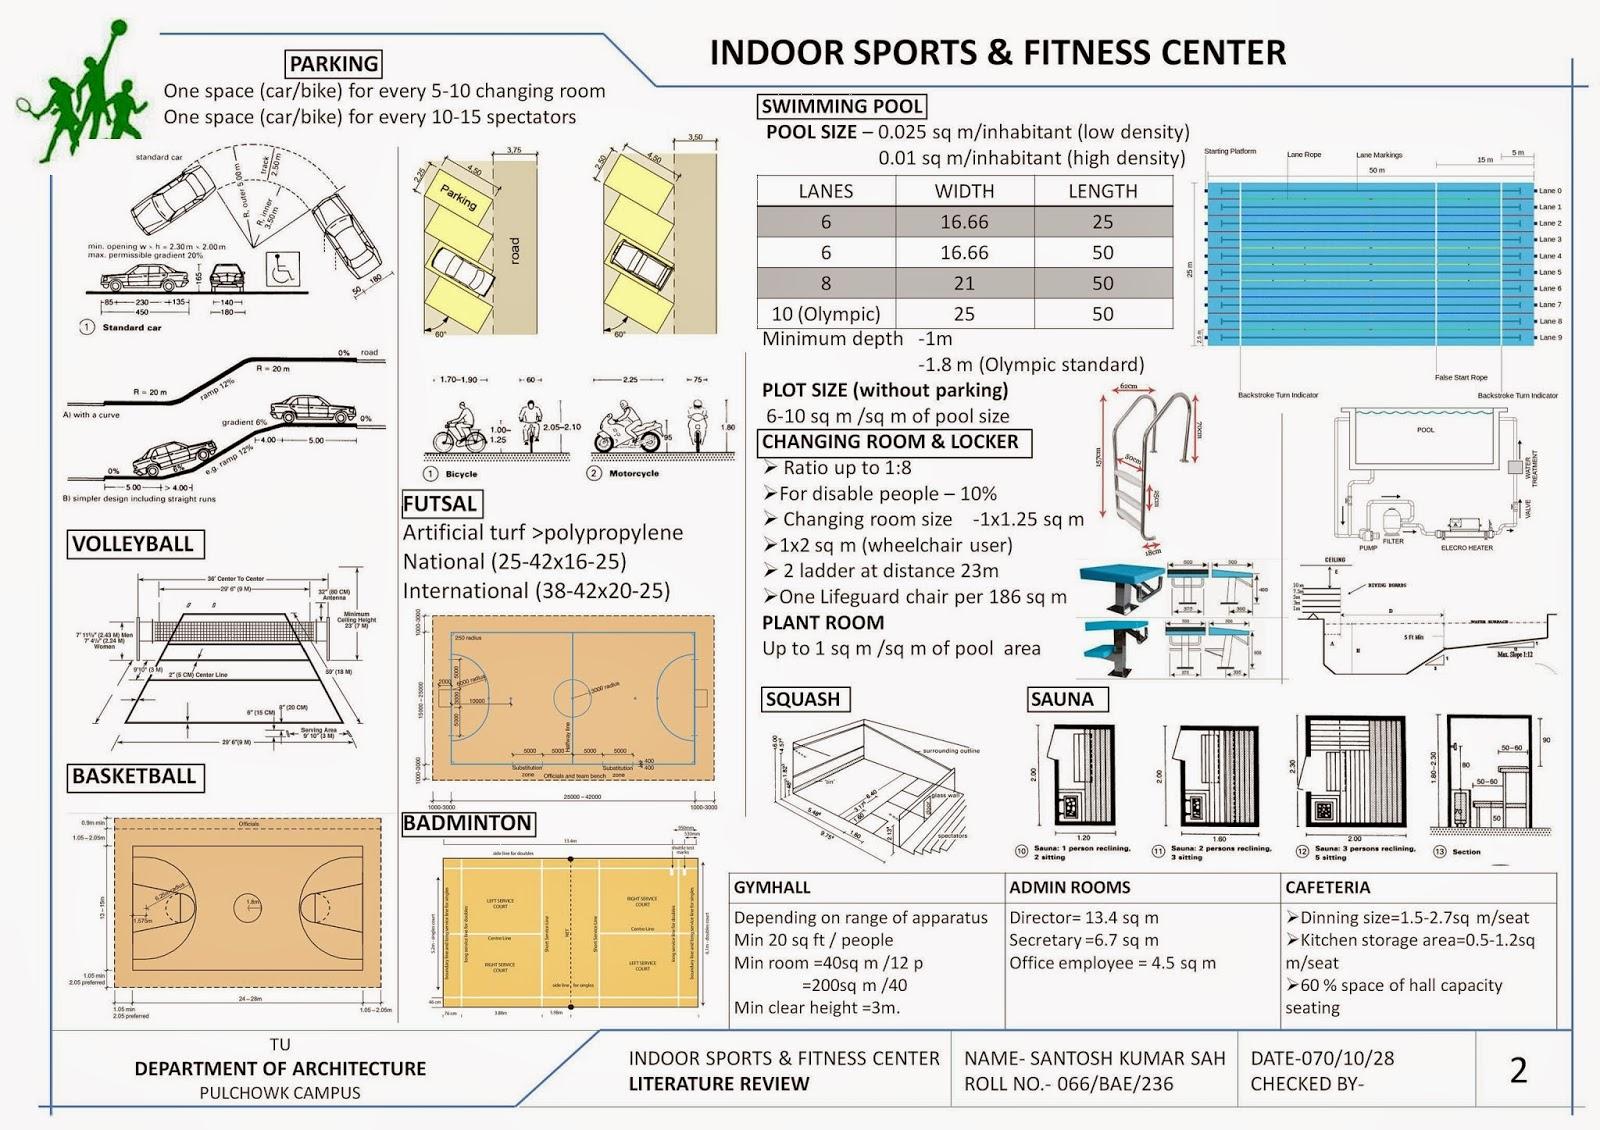 Architecture Literature Review Case Study Of Sports Complex